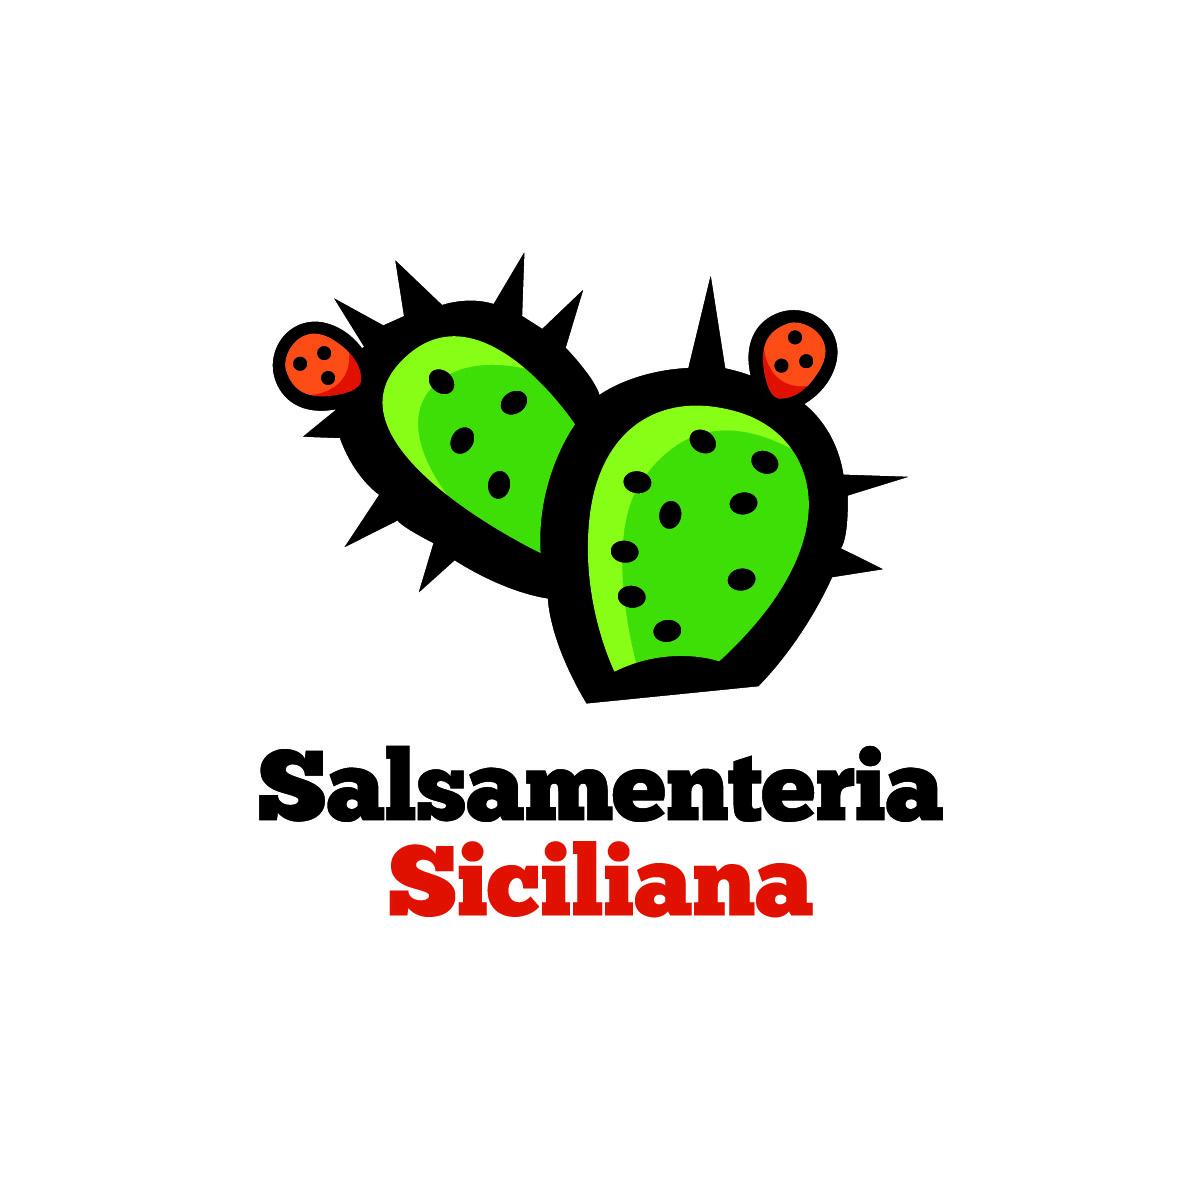 Salsamenteria Siciliana